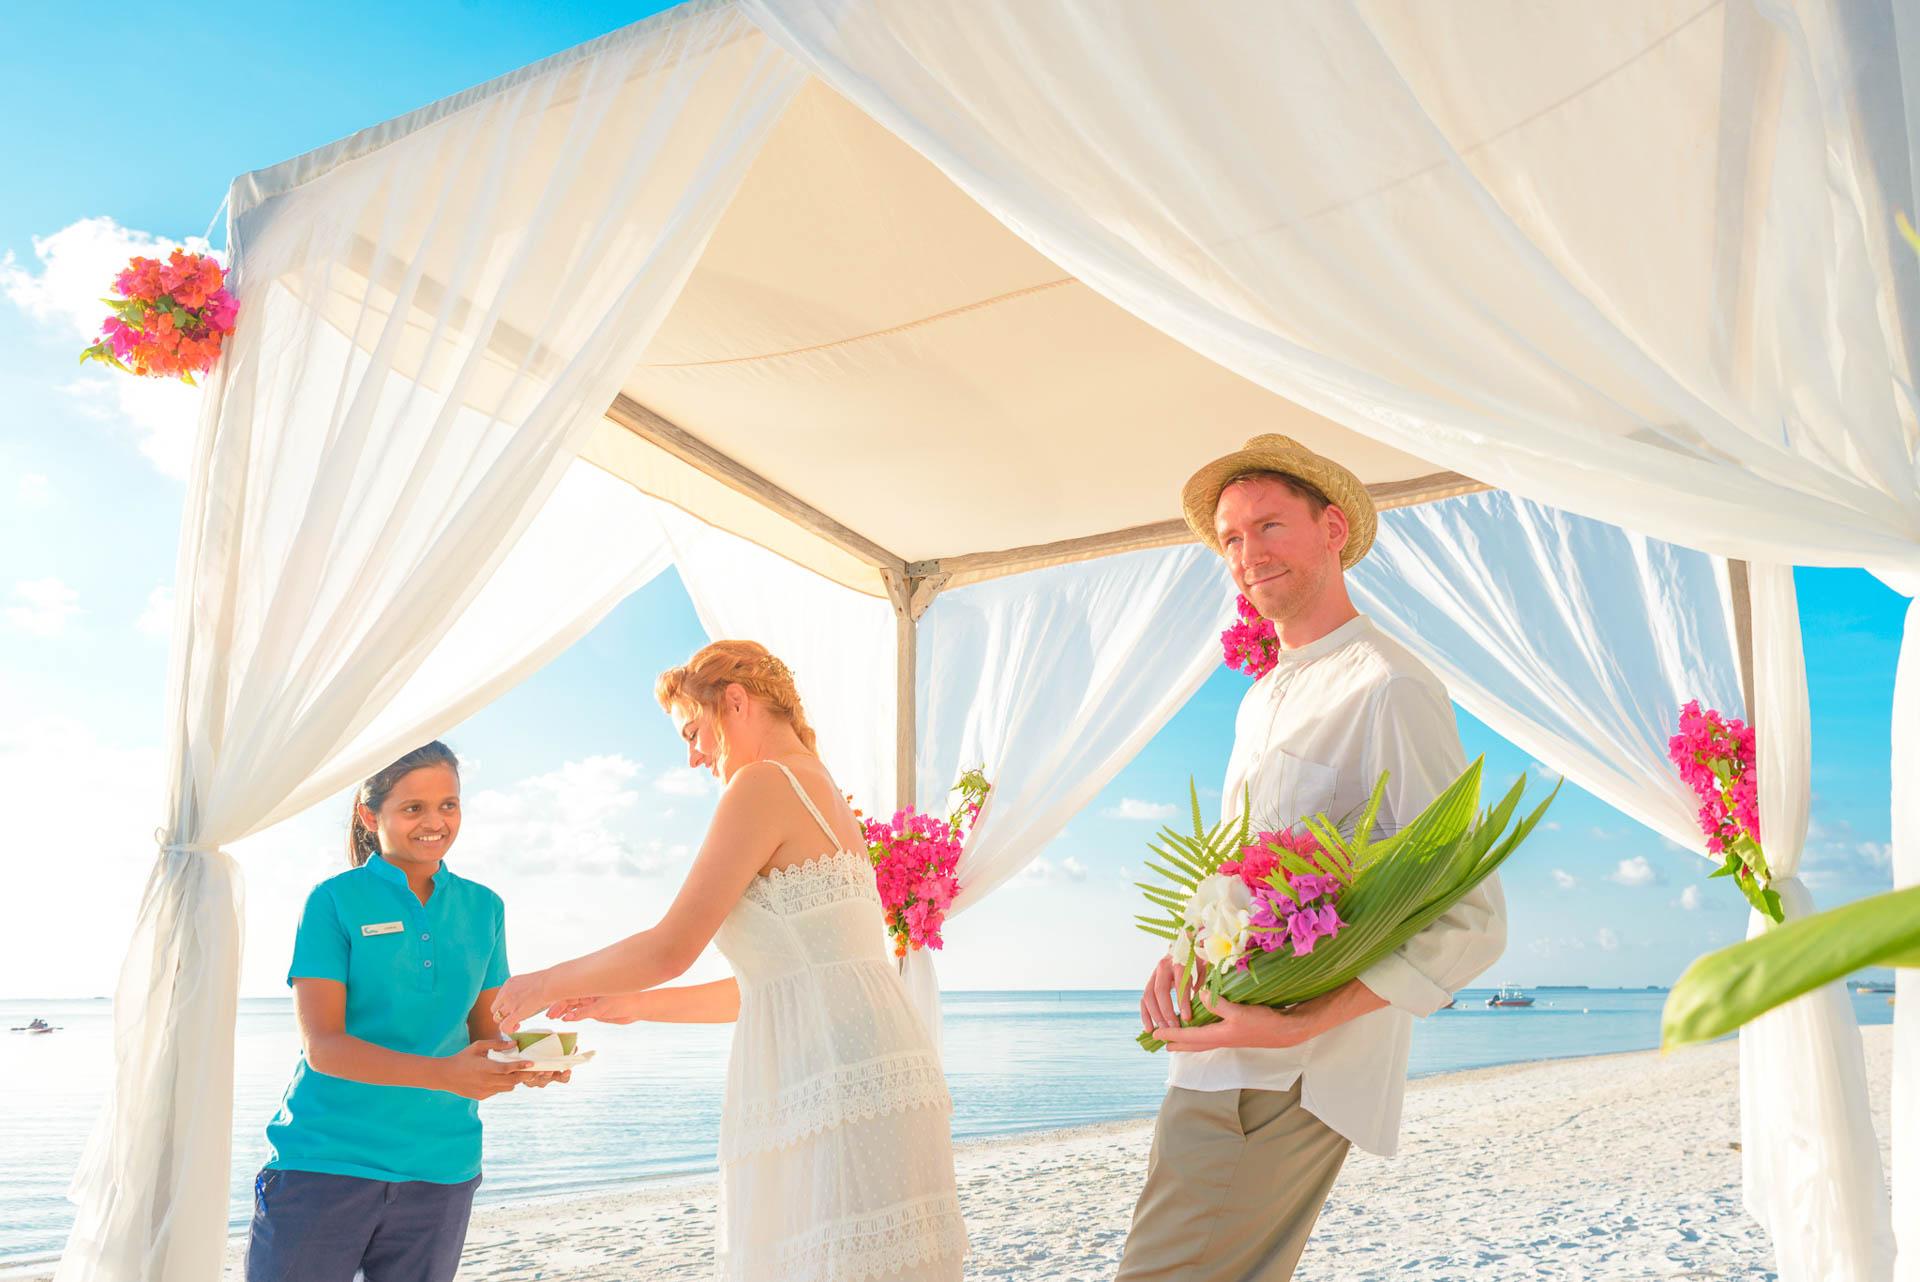 Heike Michaels Beach Wedding in Maldives 20